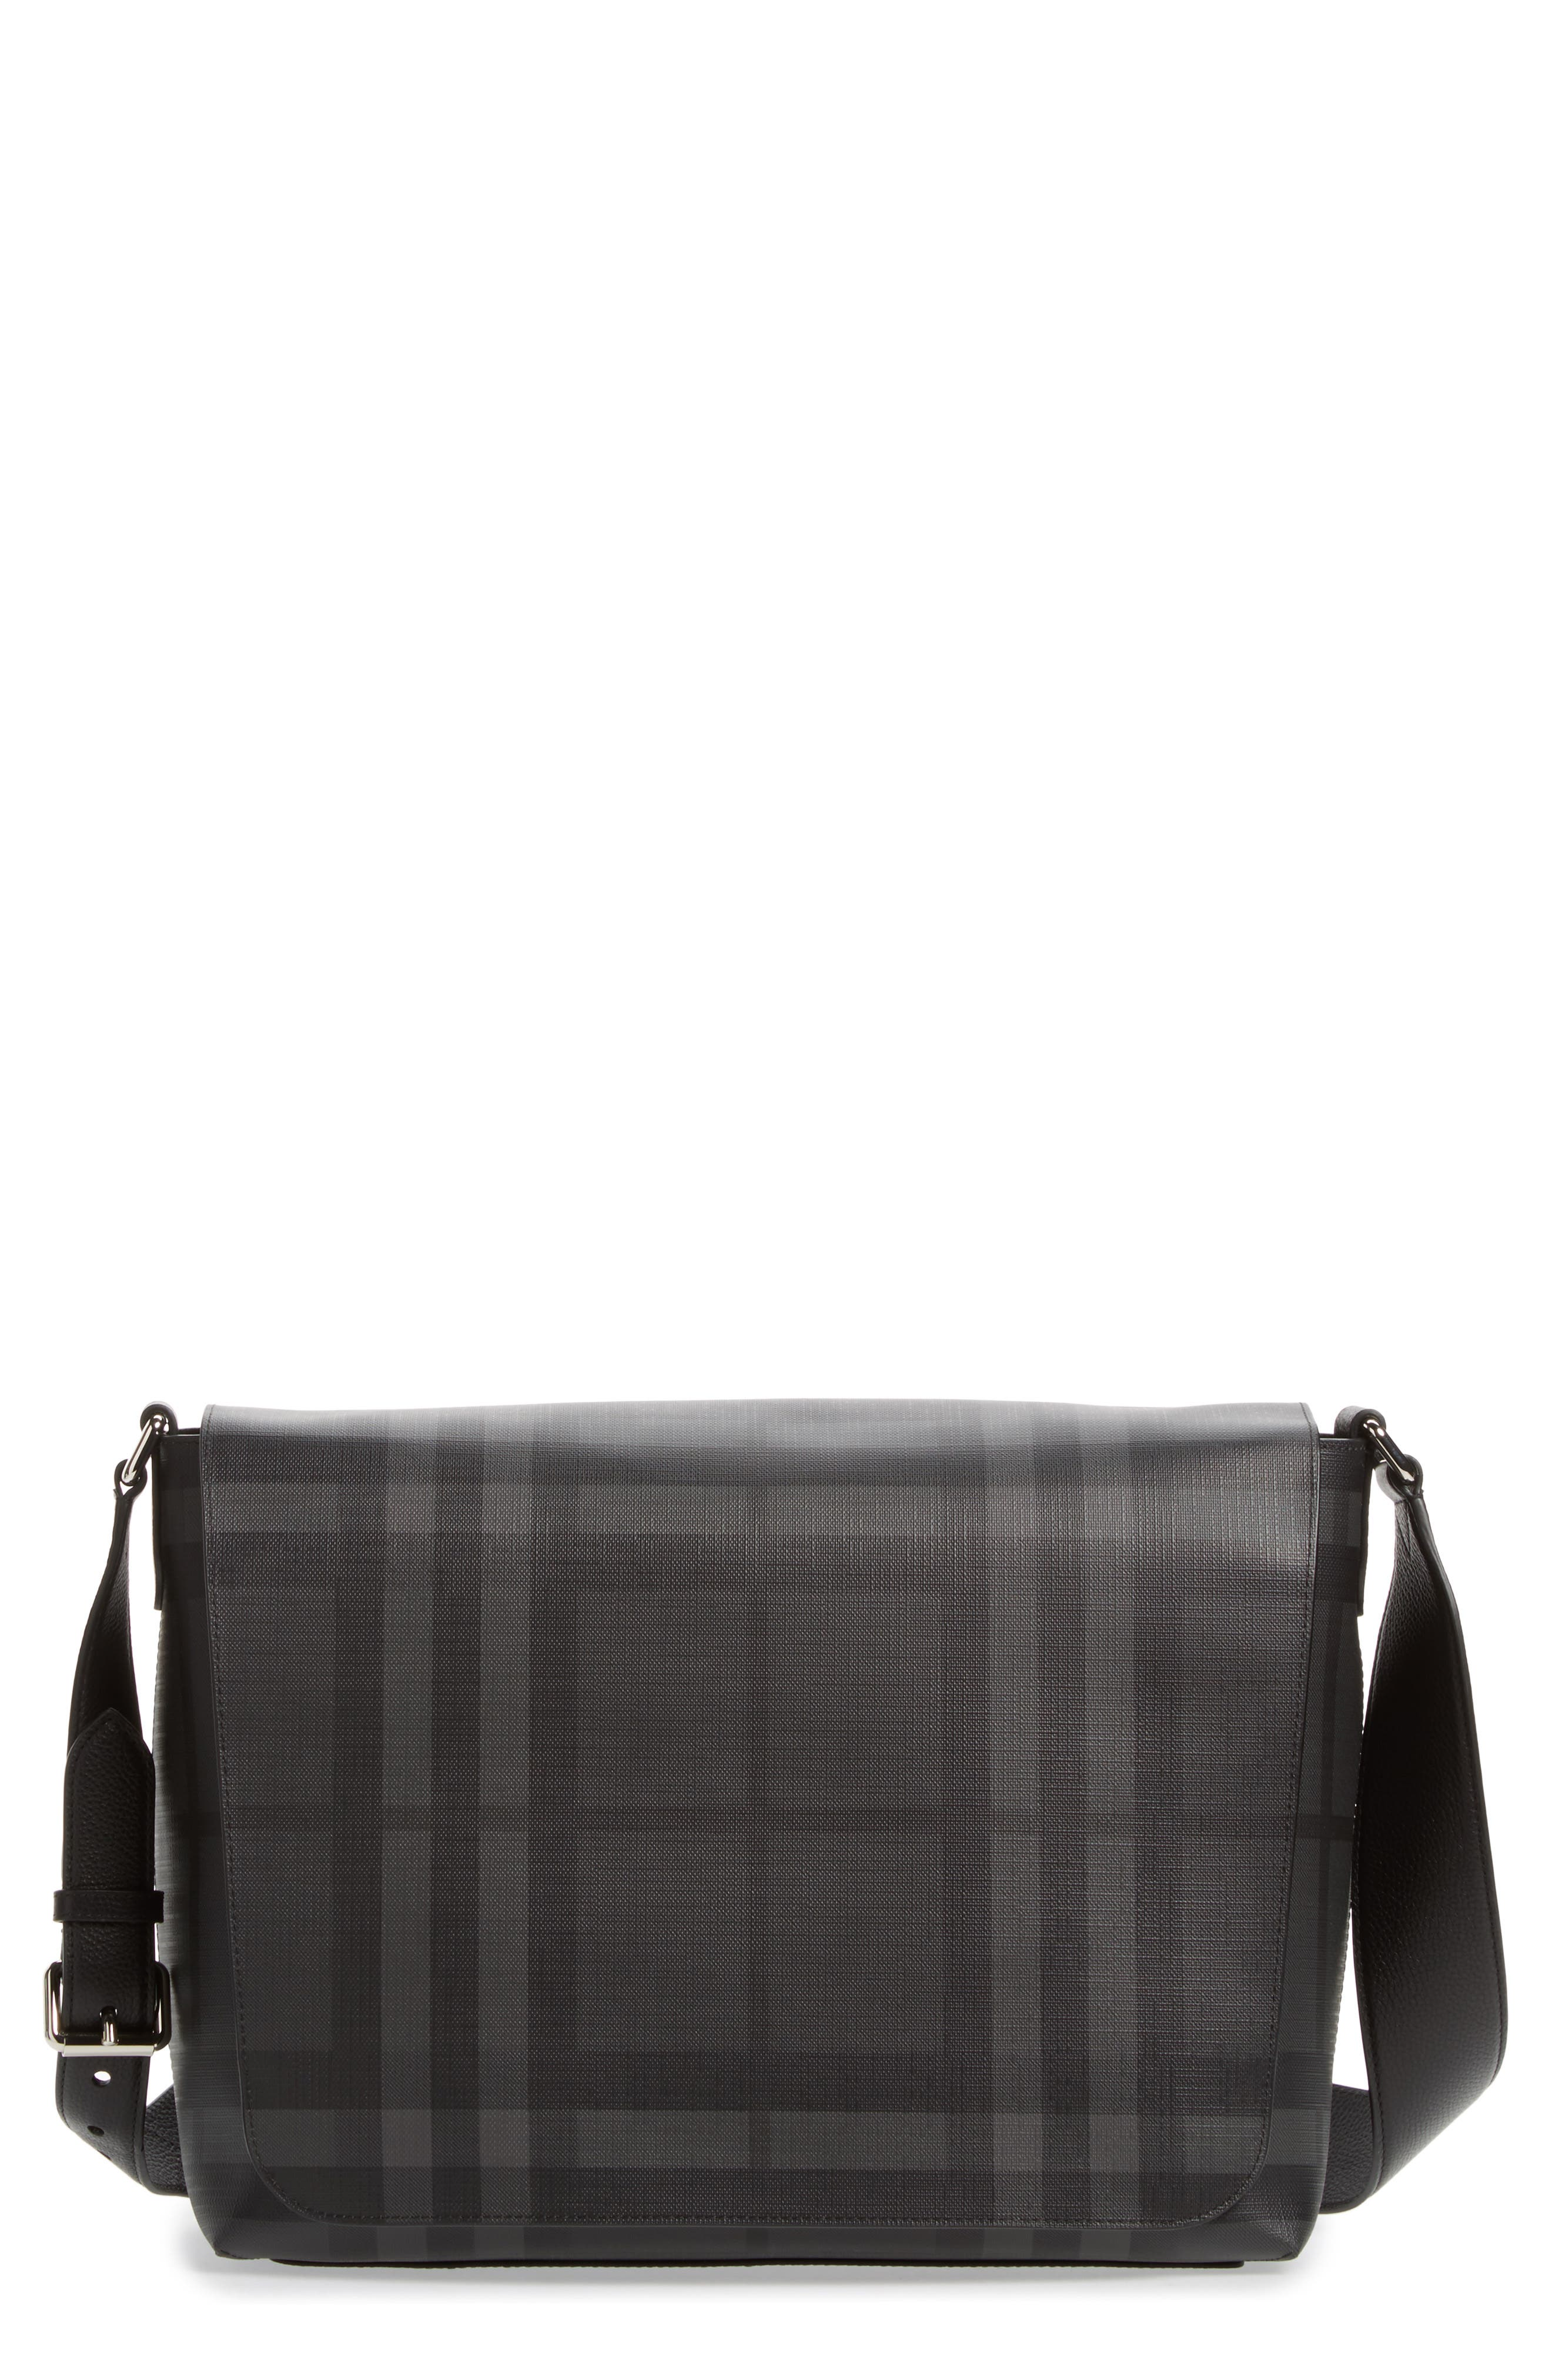 London Check Messenger Bag,                         Main,                         color, Charcoal/ Black